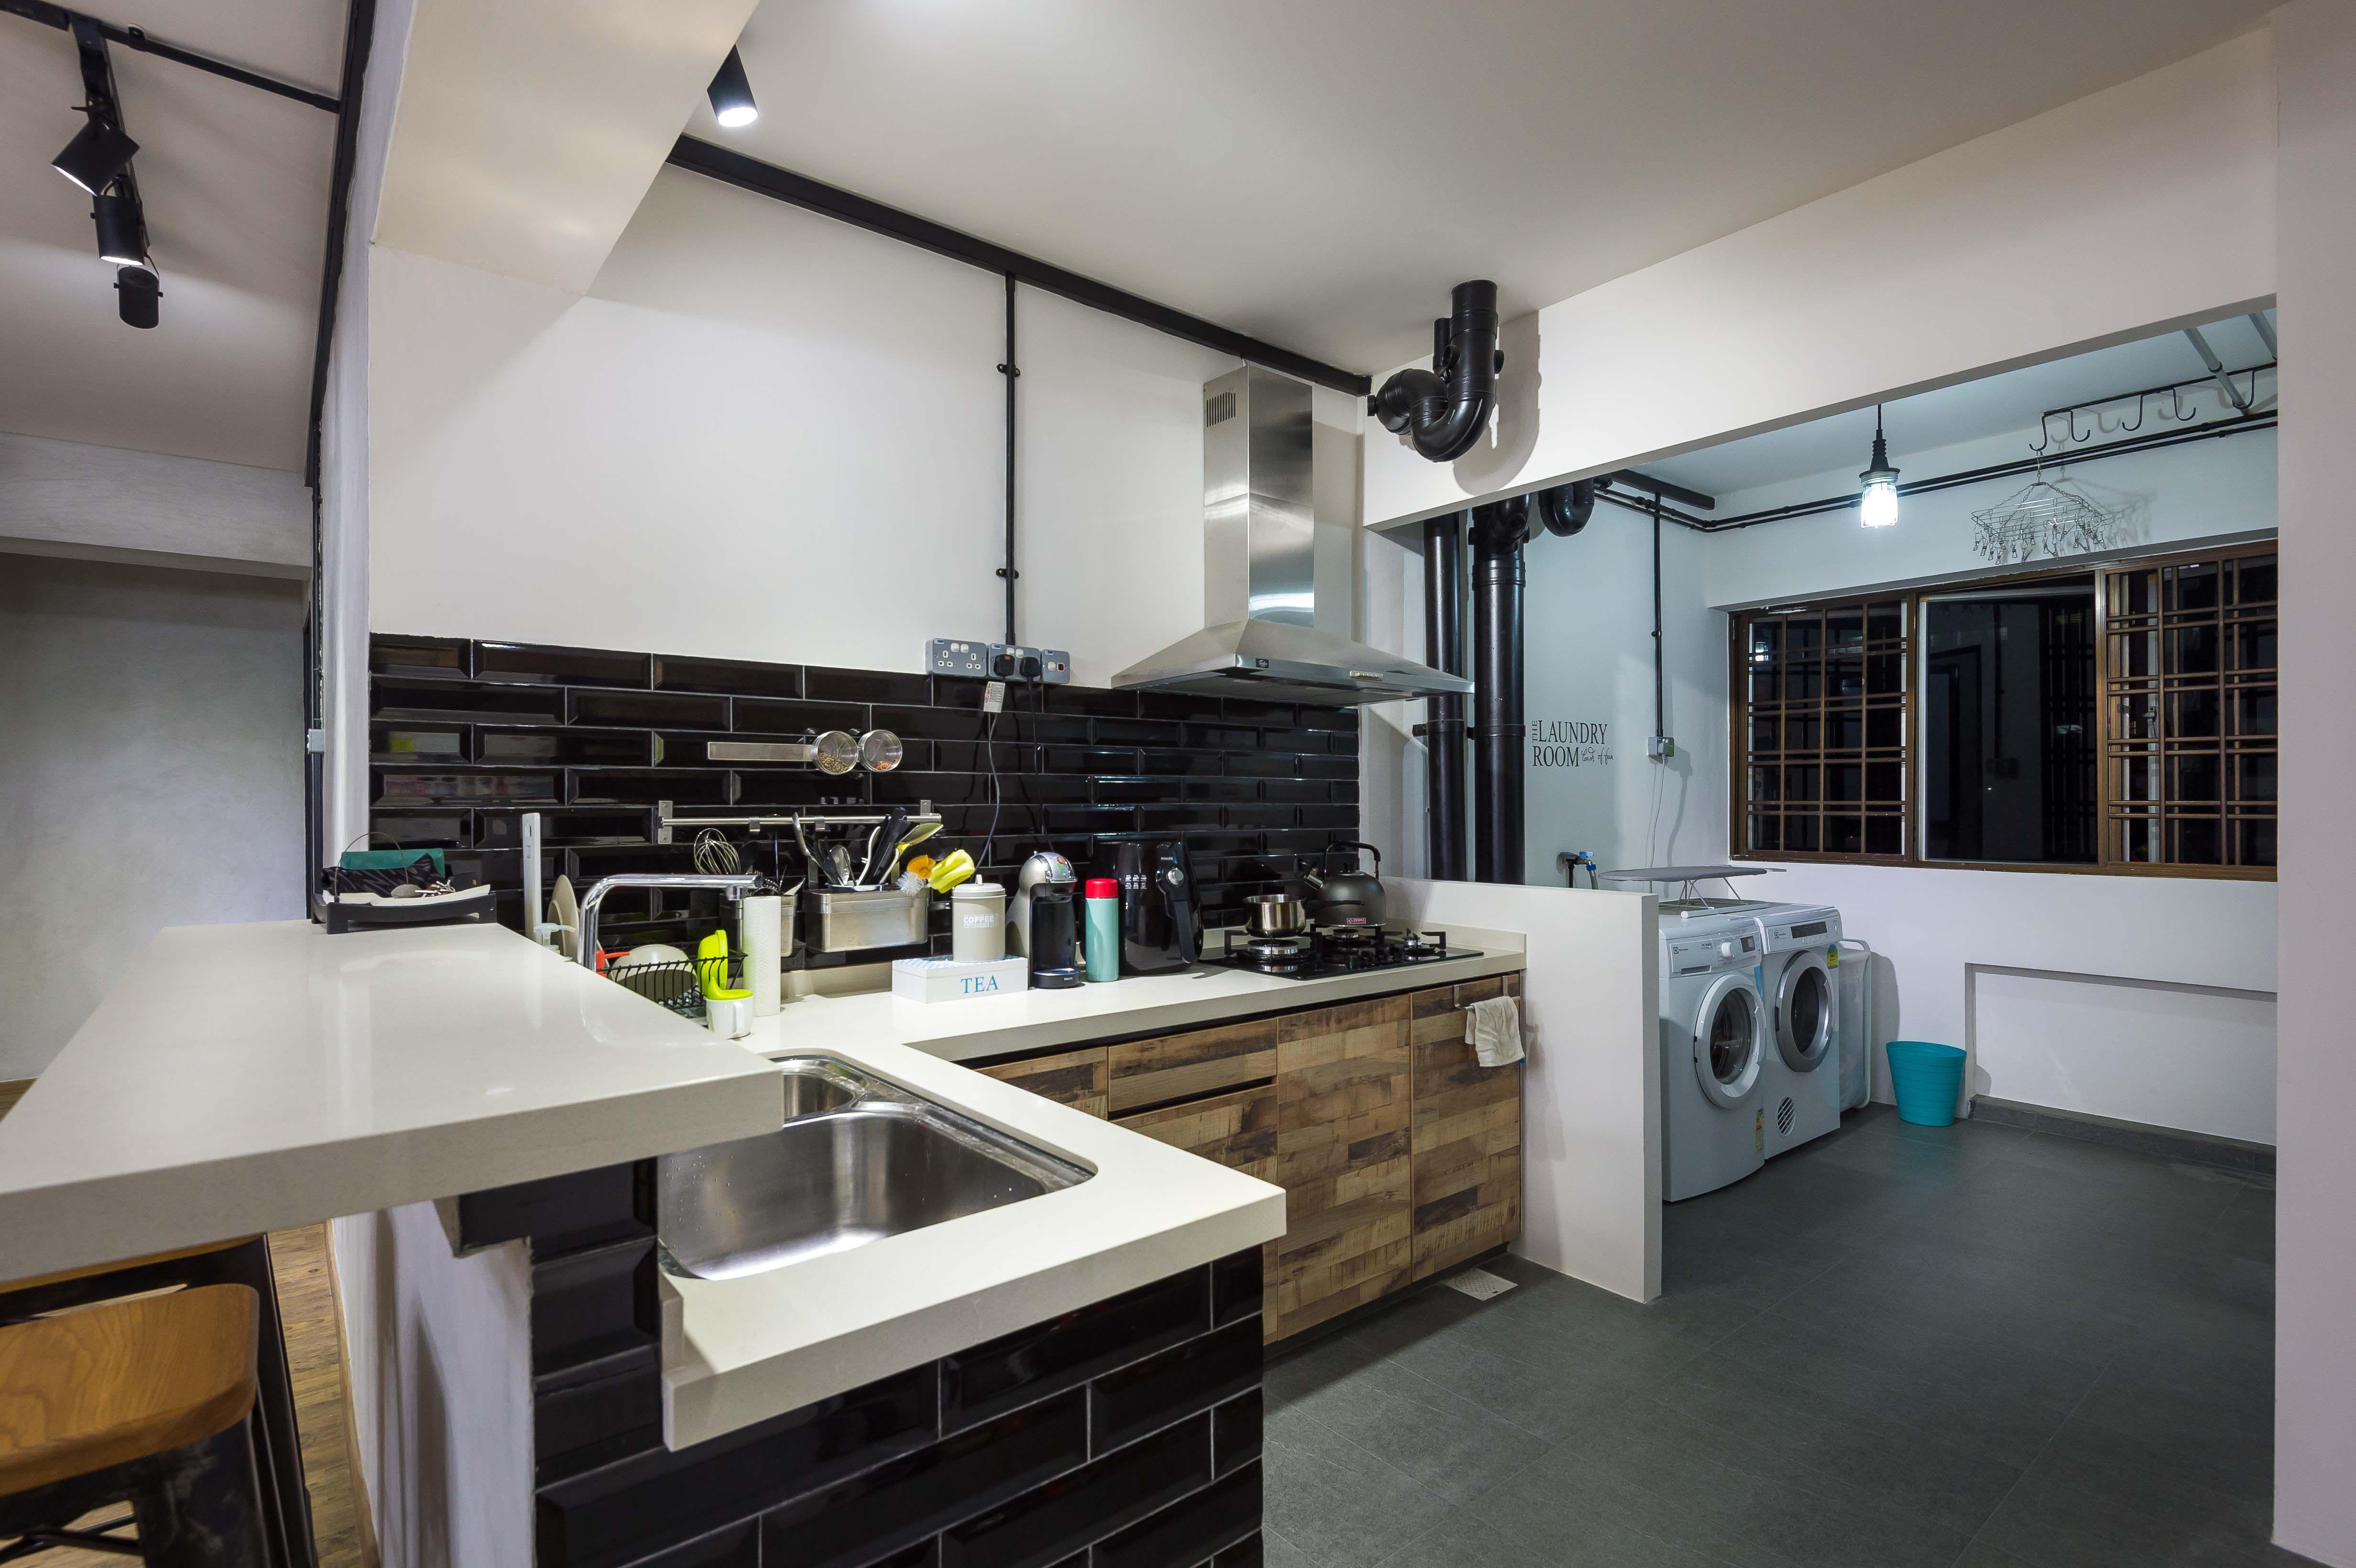 HDB 5 Room Resale Industrial Design Open Kitchen Concept